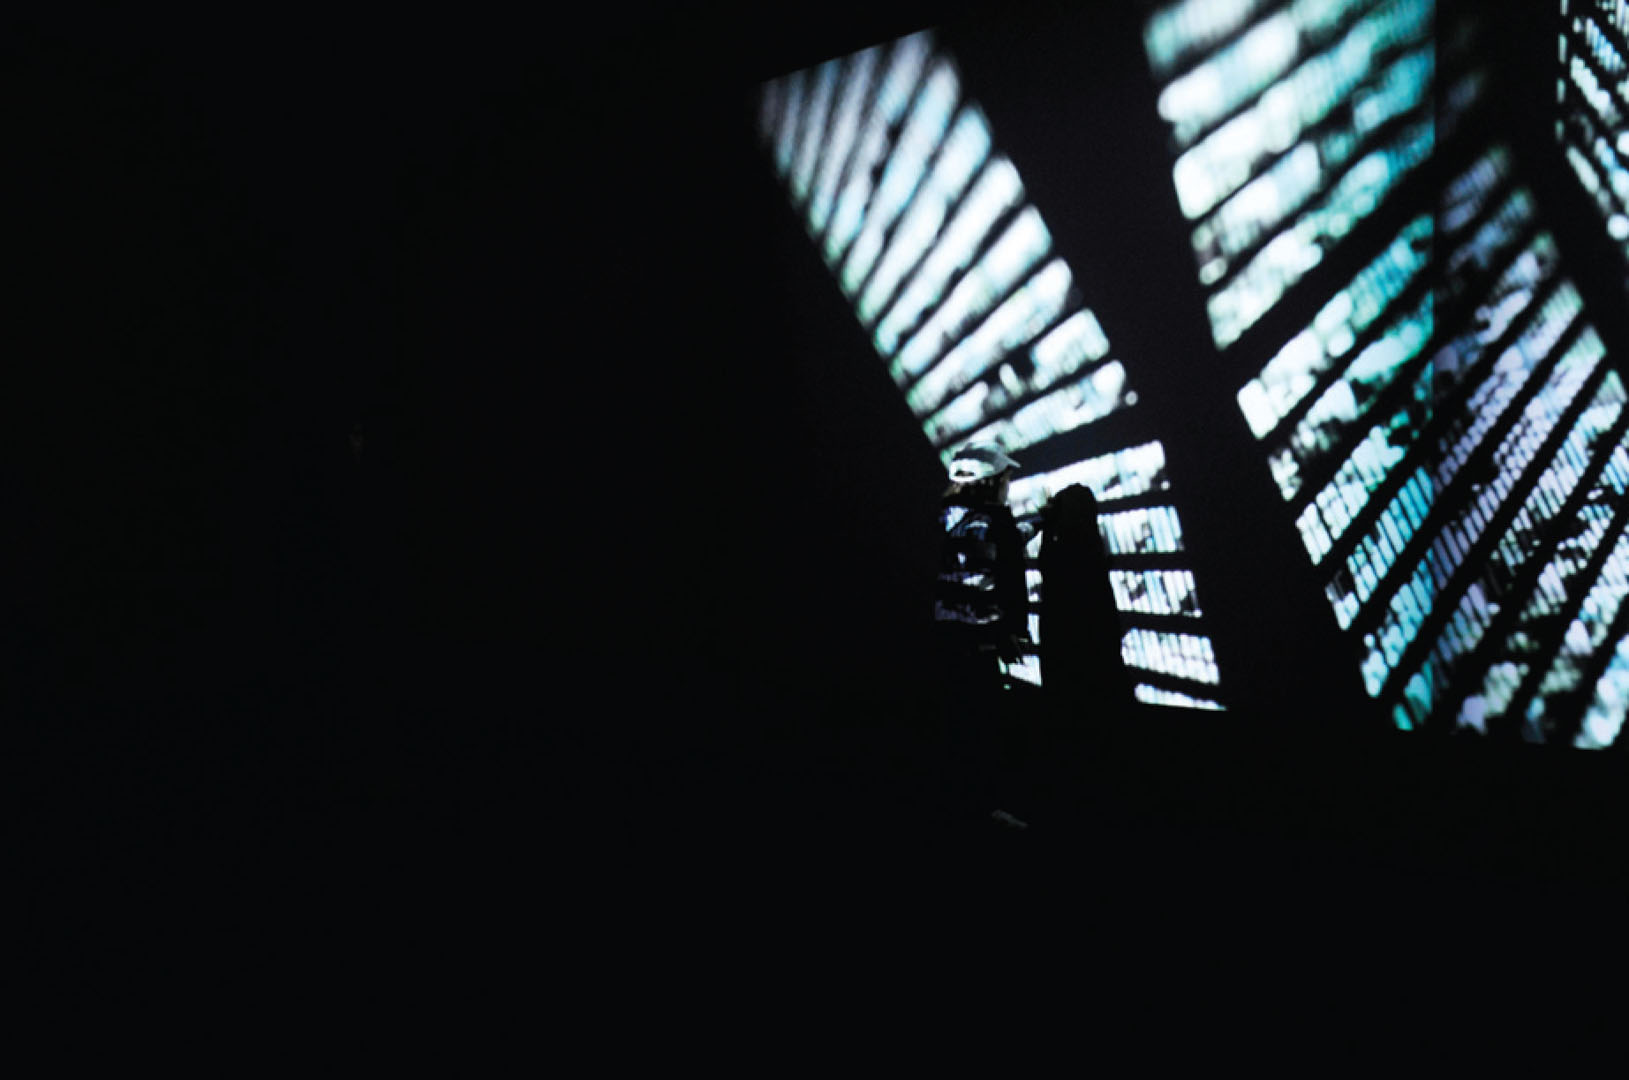 ©, Wow Inc., Lights and Shadows